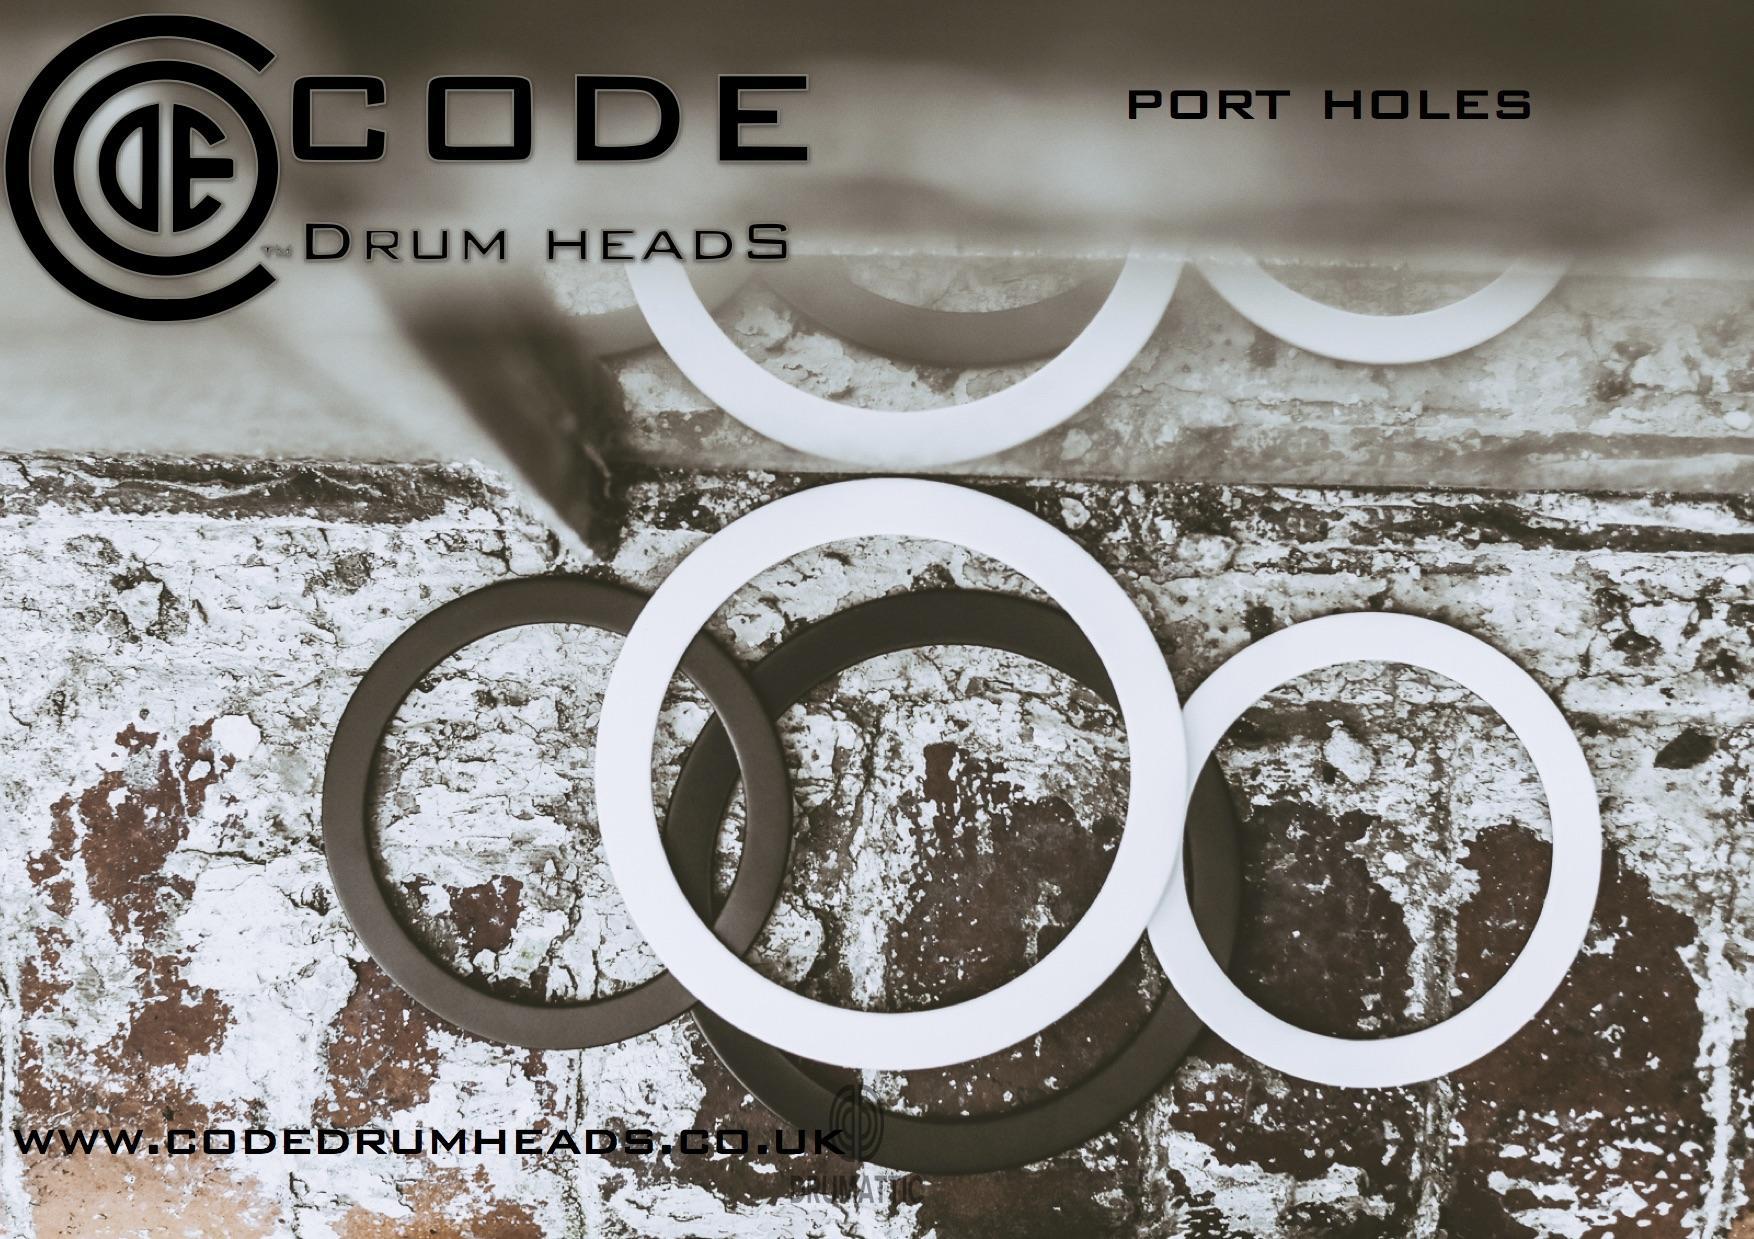 bass drum port holes 4 5 black white drumattic. Black Bedroom Furniture Sets. Home Design Ideas